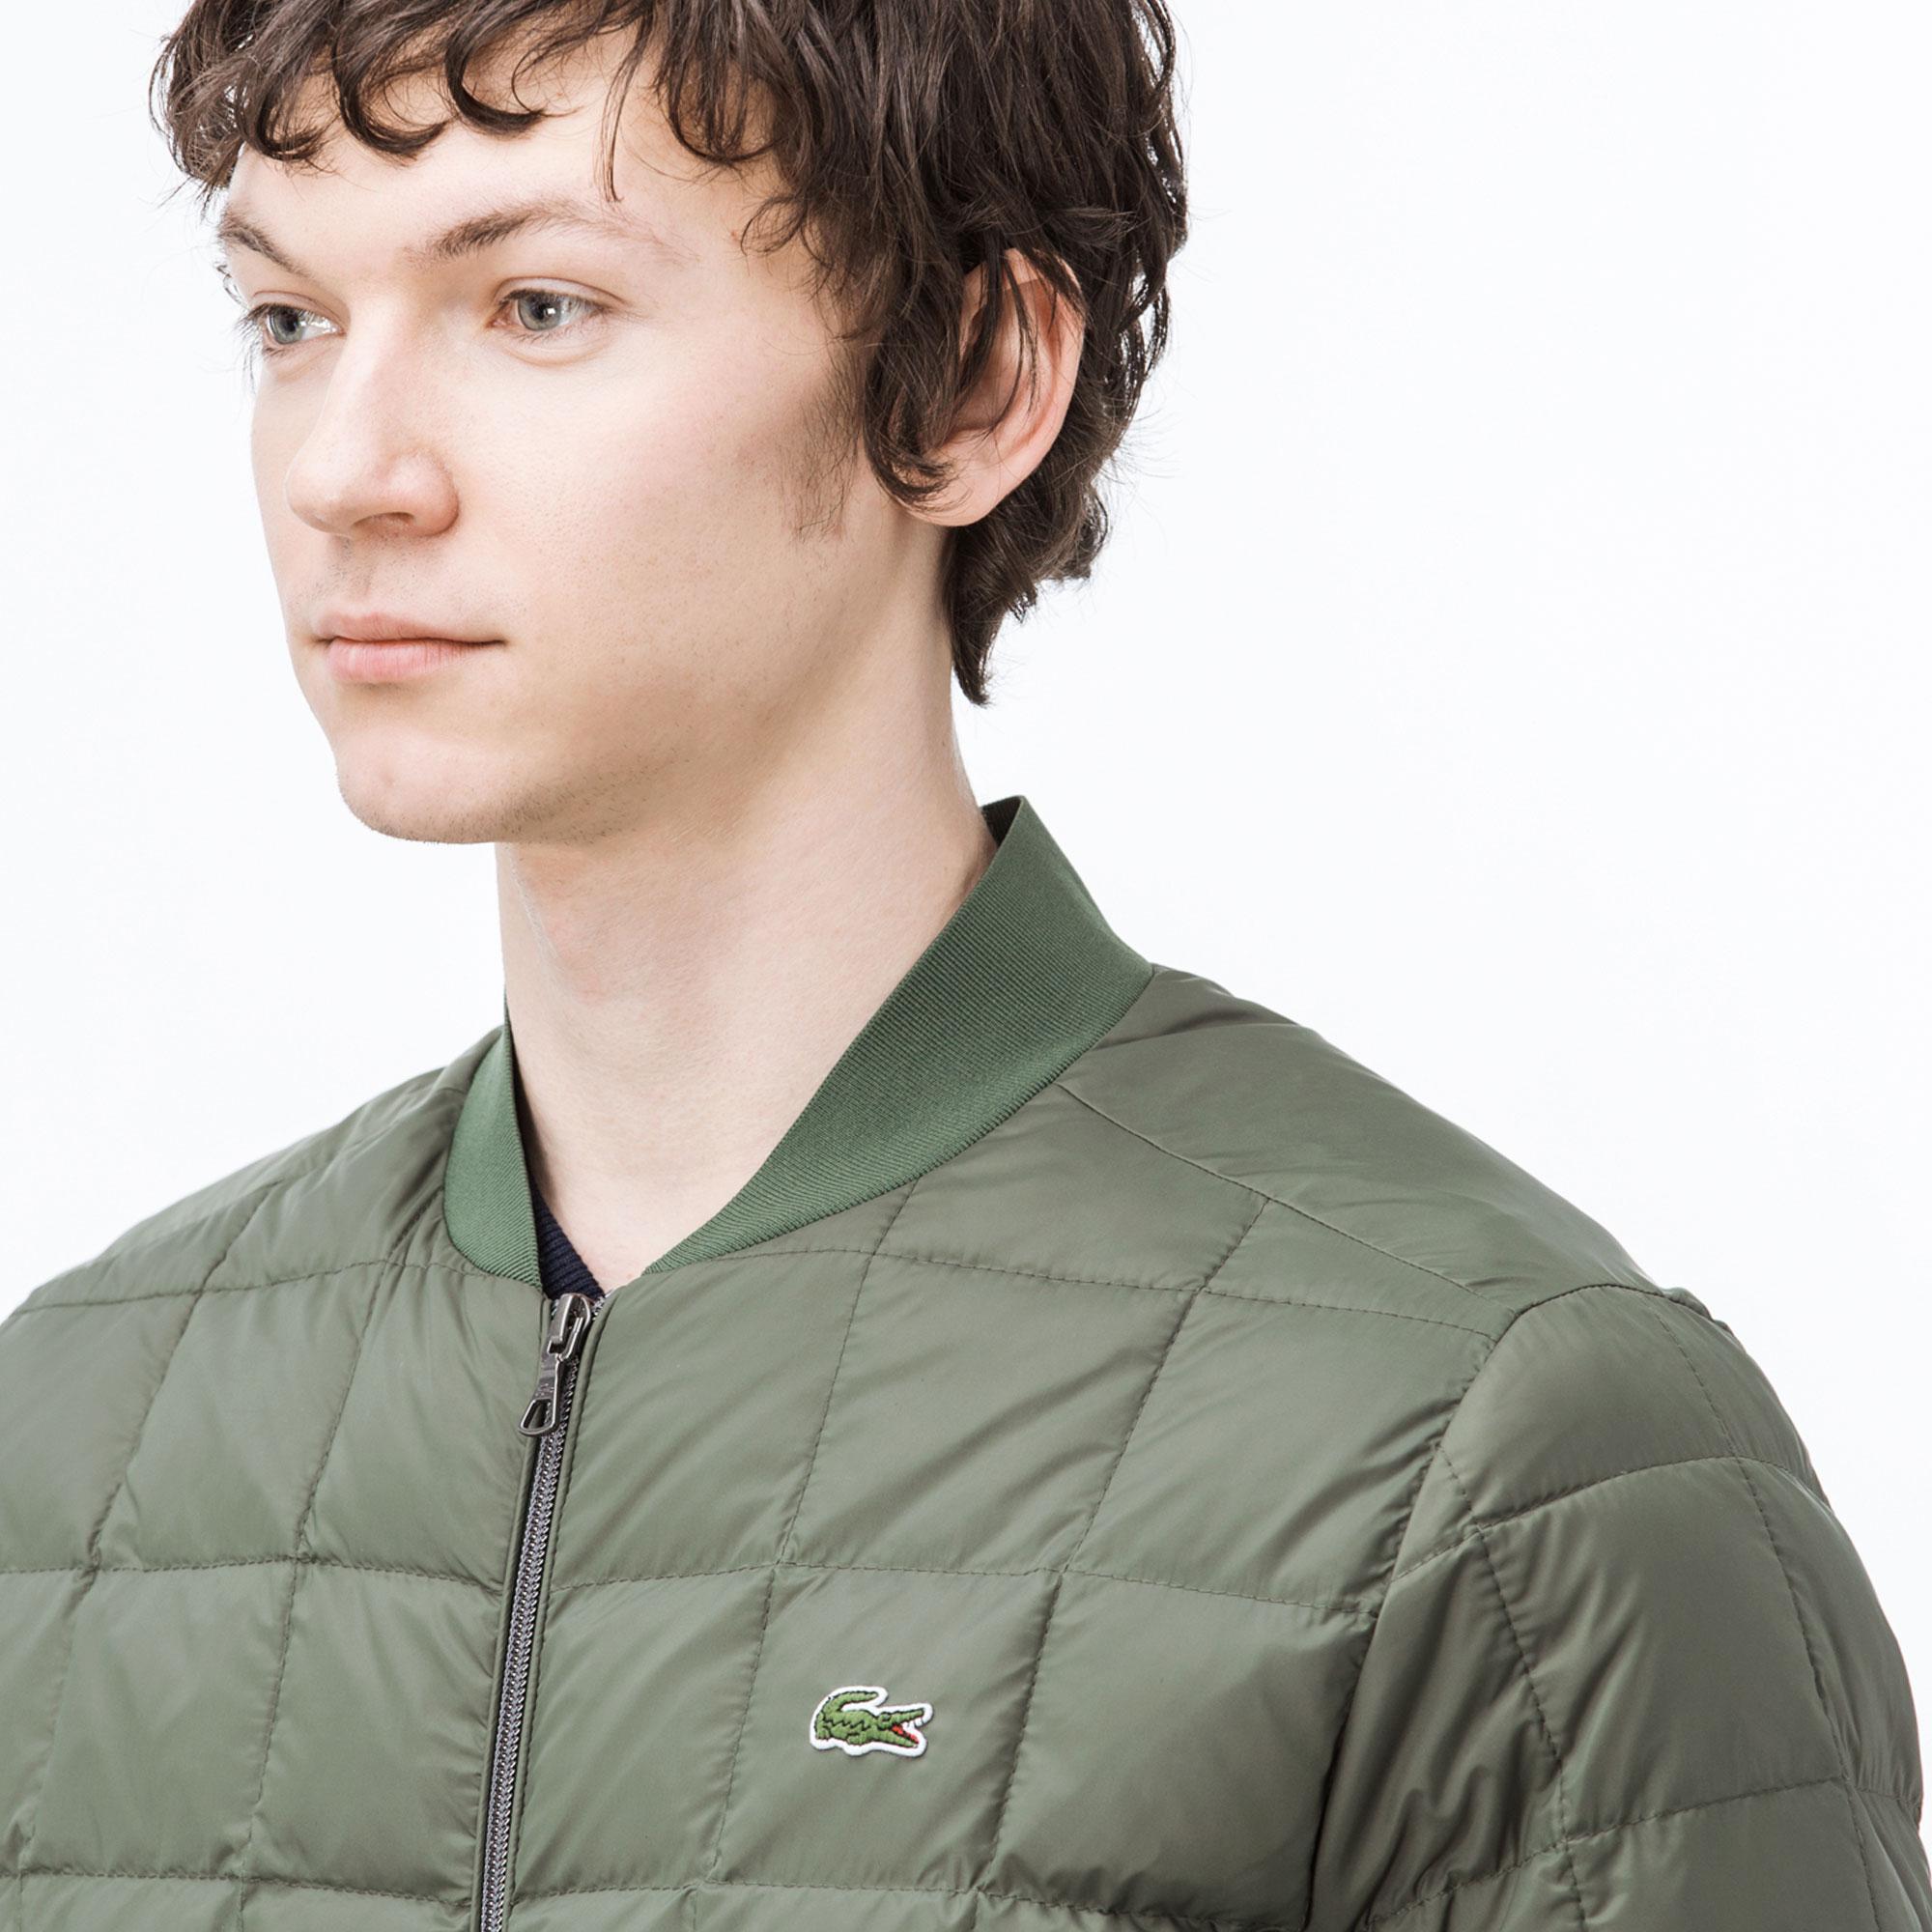 Lacoste Erkek Kapitone Yeşil Bomber Mont